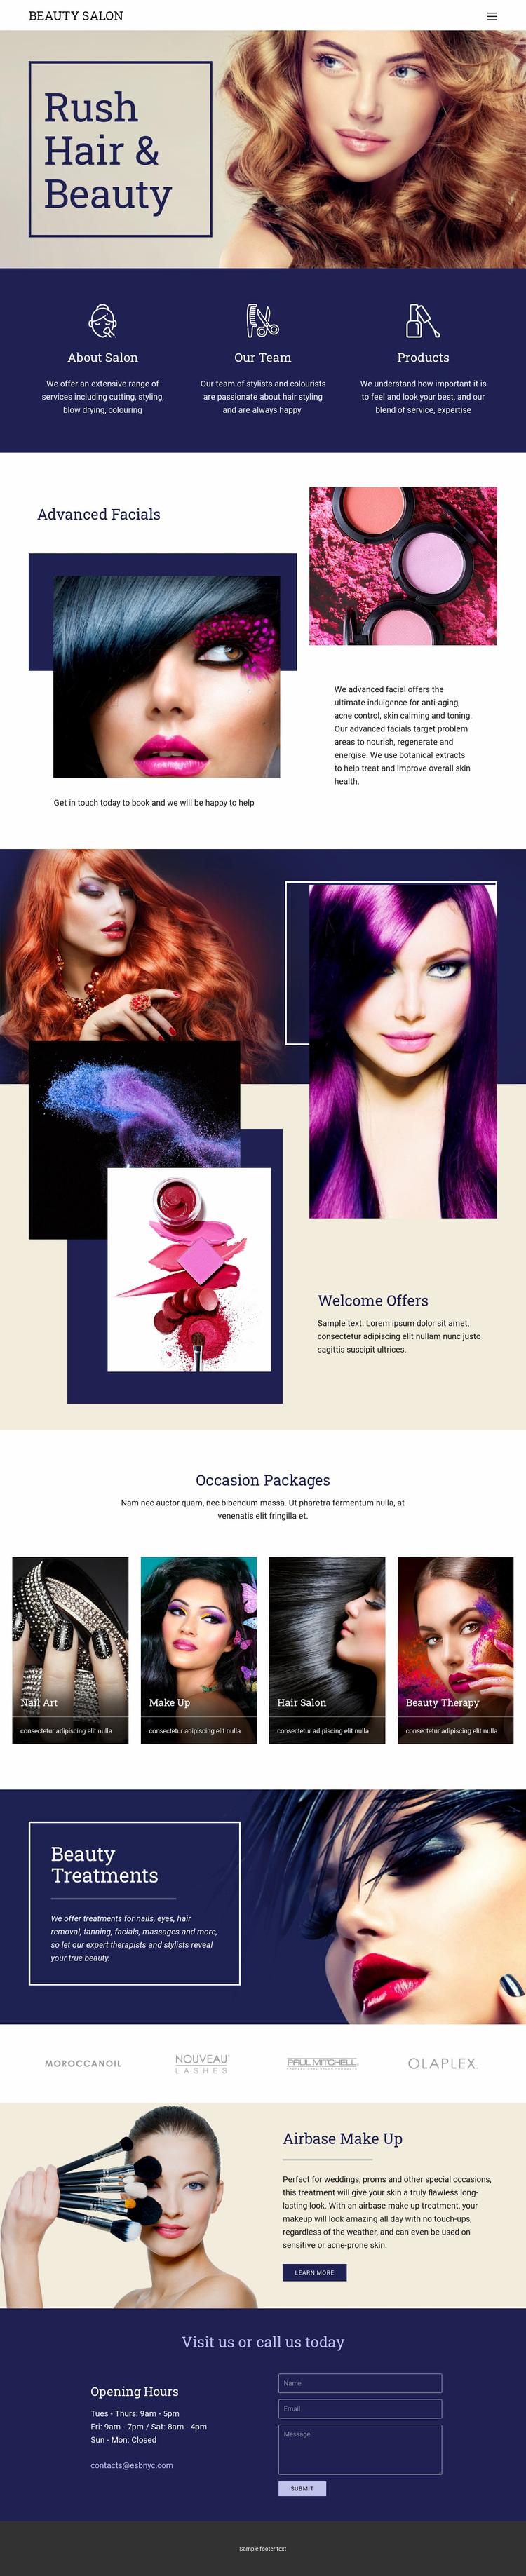 Beauty Salon Web Page Designer